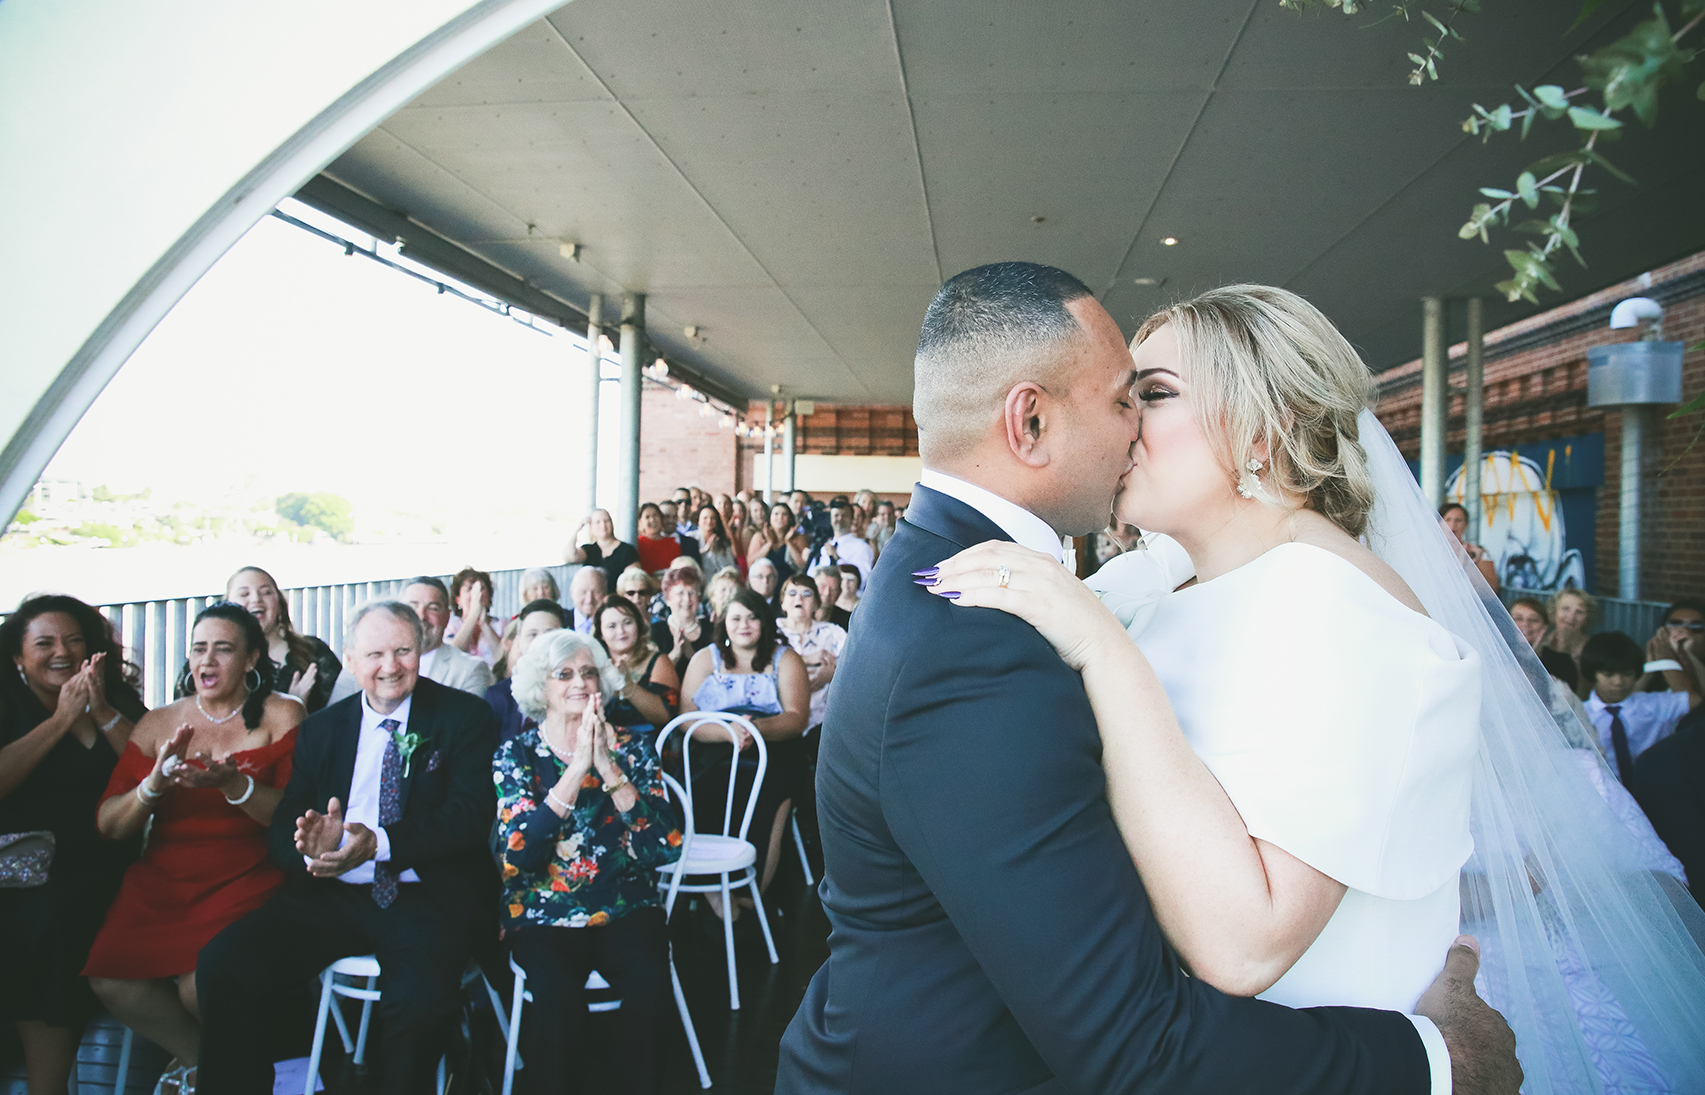 Brisbane Powerhouse Wedding Photographer